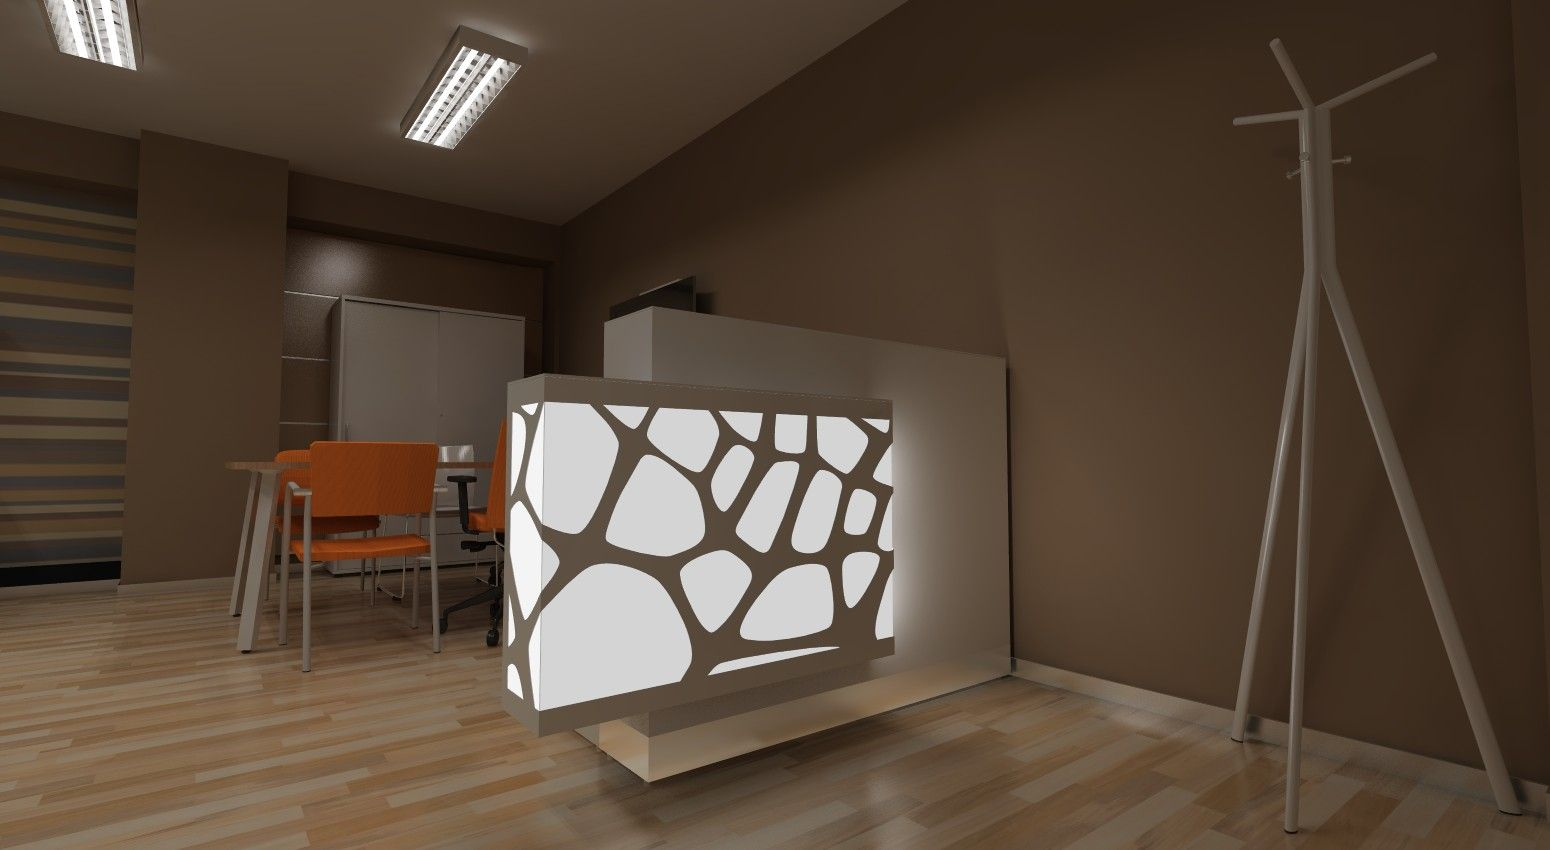 Office interior 3d model rendering created by mari n jur k using new turbocad pro platinum for Interior design 3d rendering software